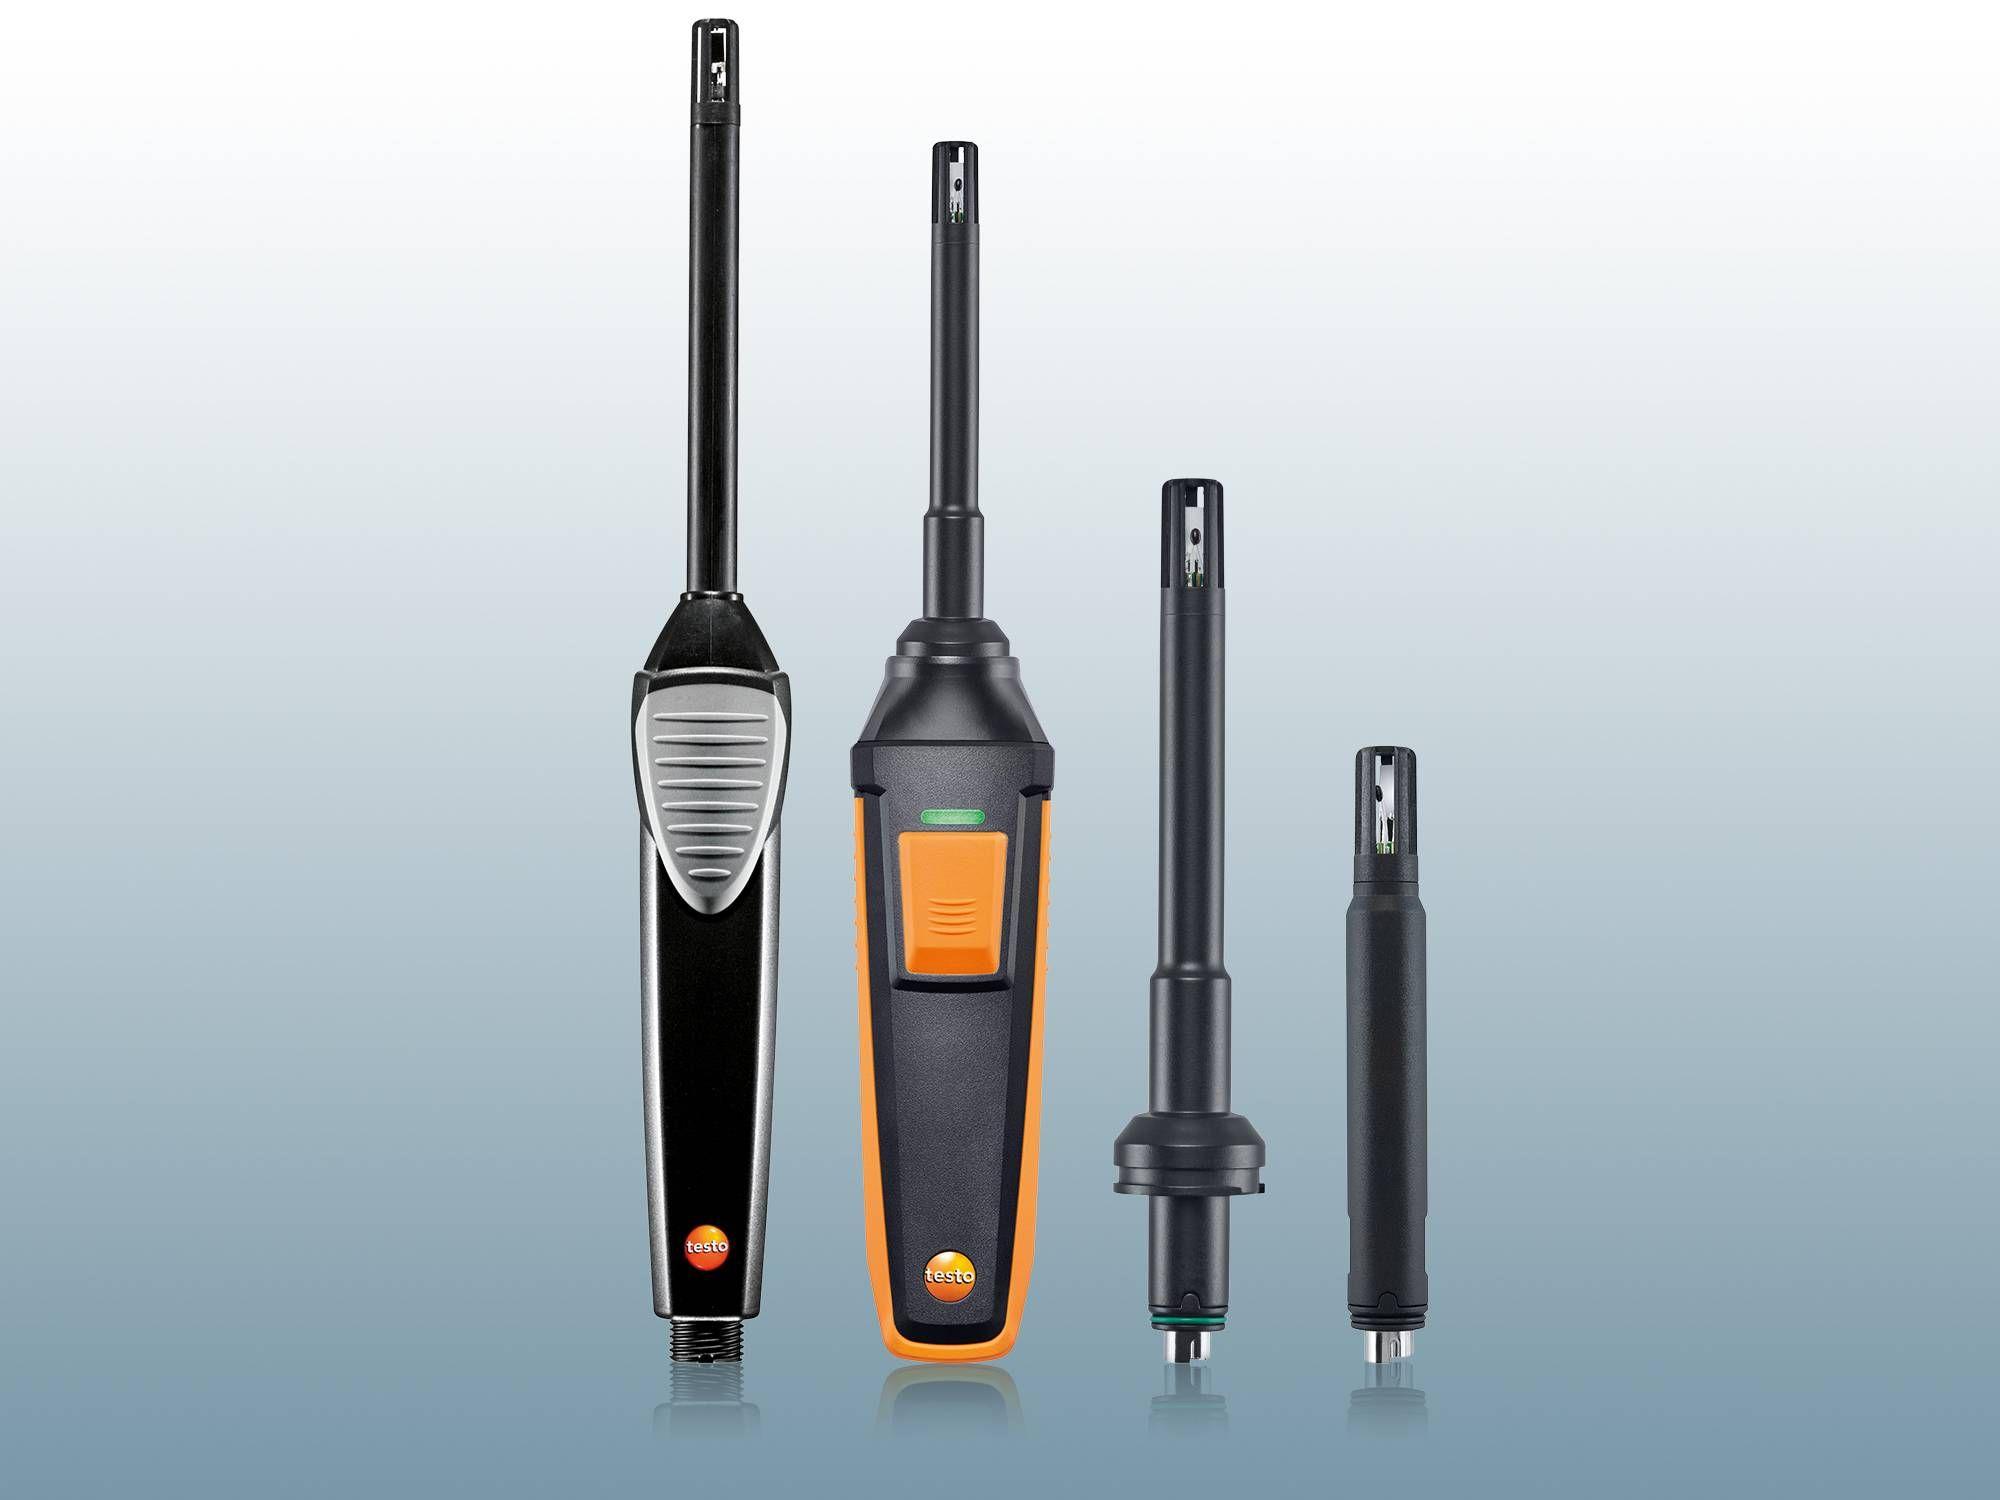 Testo hygrometer